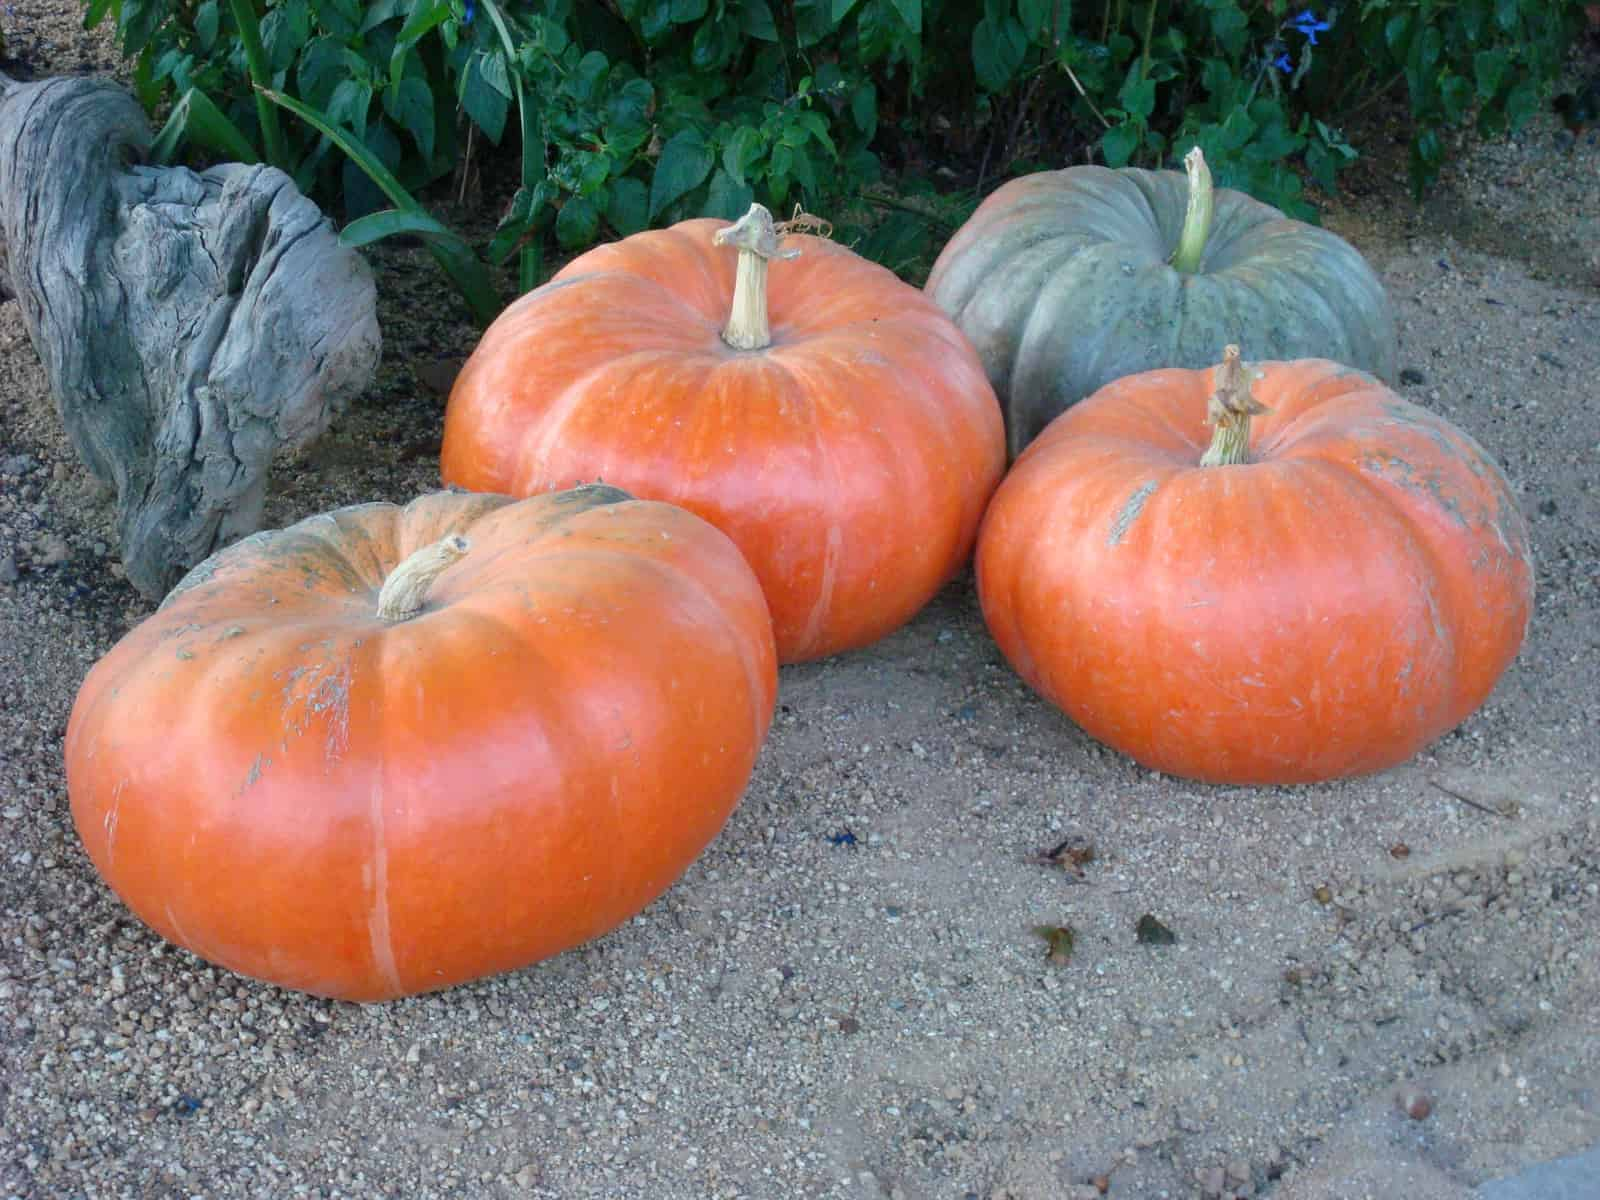 Fairytale pumpkin how to grow for Best pumpkins to grow